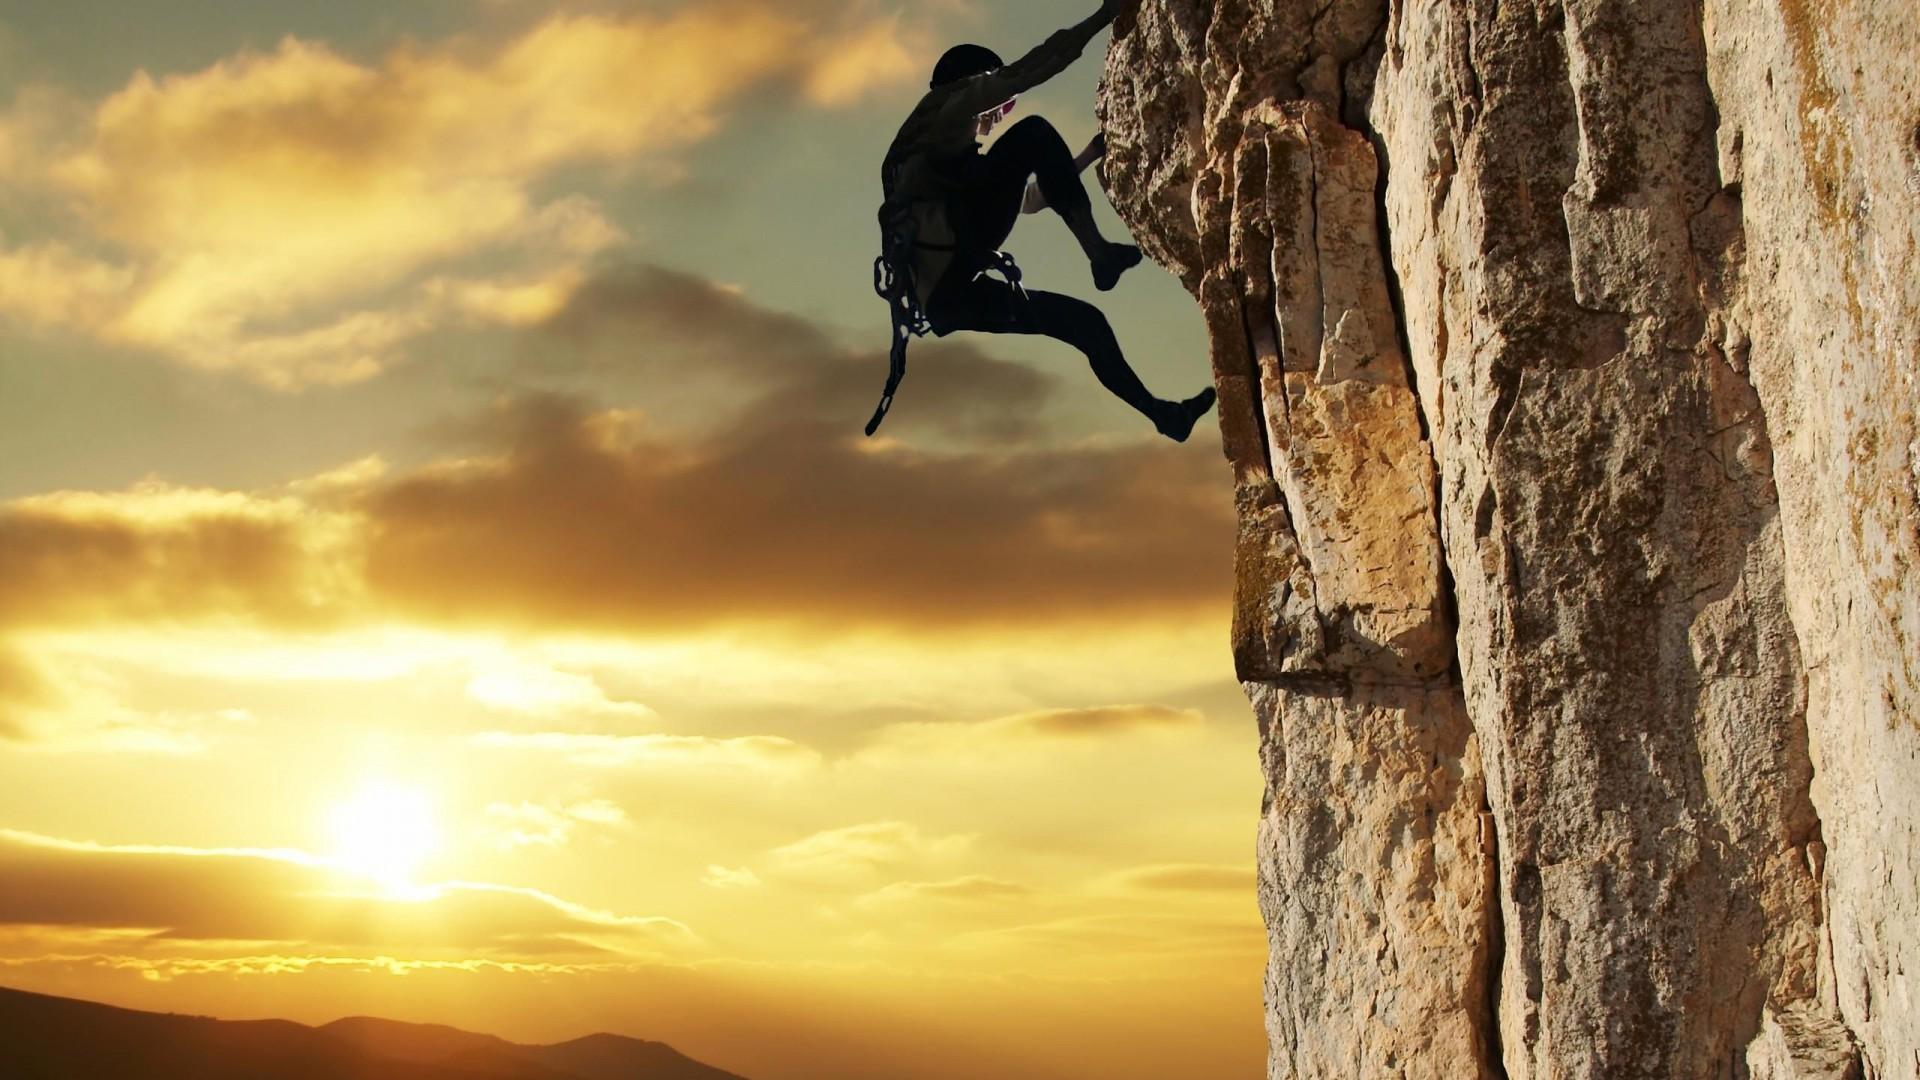 mountain-climbing-background-image-hd-wallpaper-wide-free.jpg